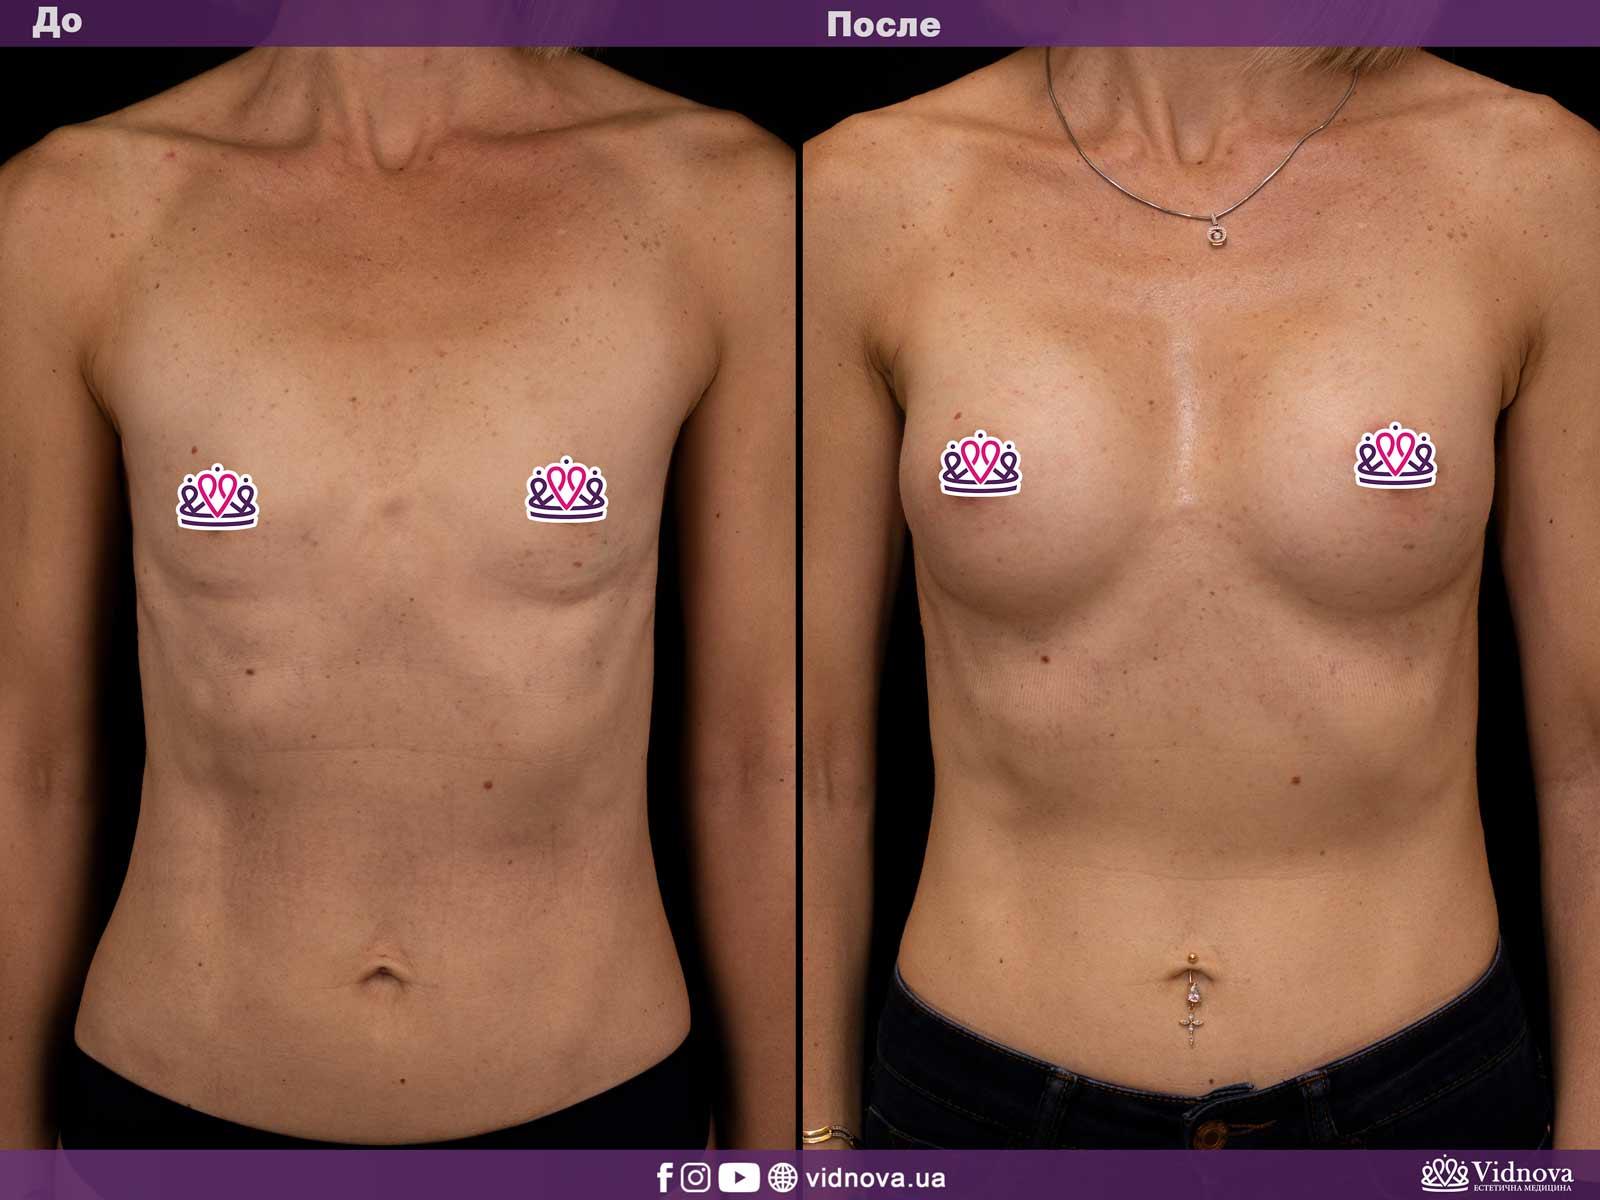 Увеличение груди: Фото ДО и ПОСЛЕ - Пример №14-1 - Клиника Vidnova